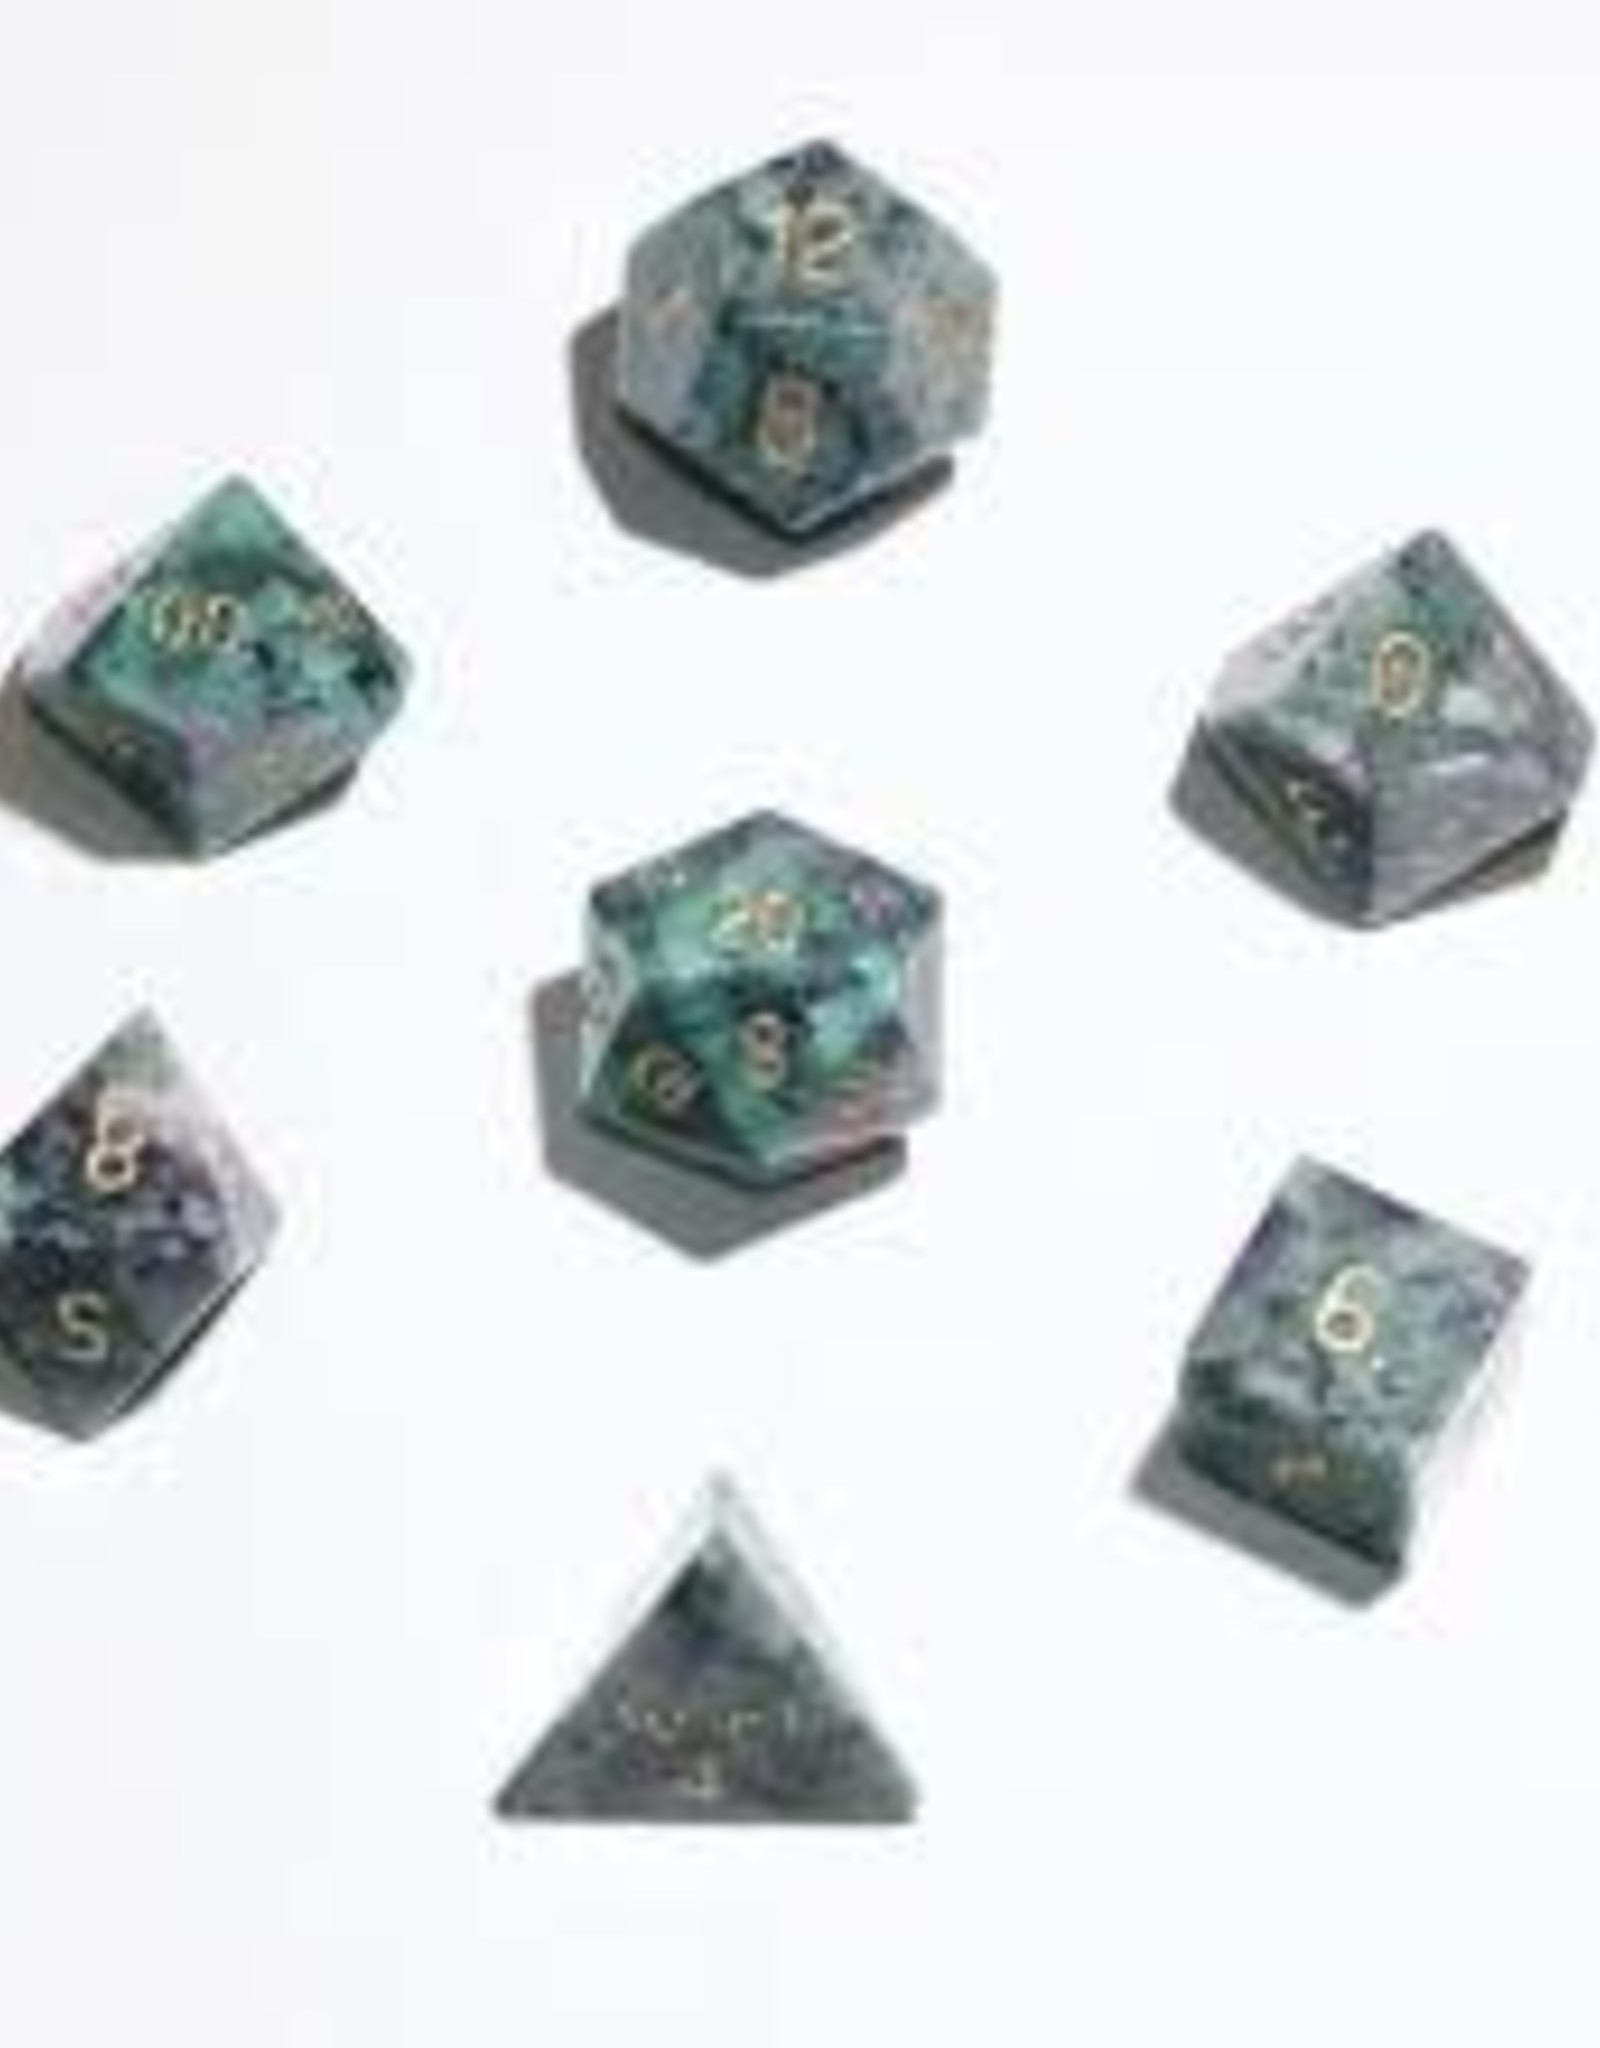 Crystal Caste 16mm Ruby Josite - large 7 set (gold numbers)